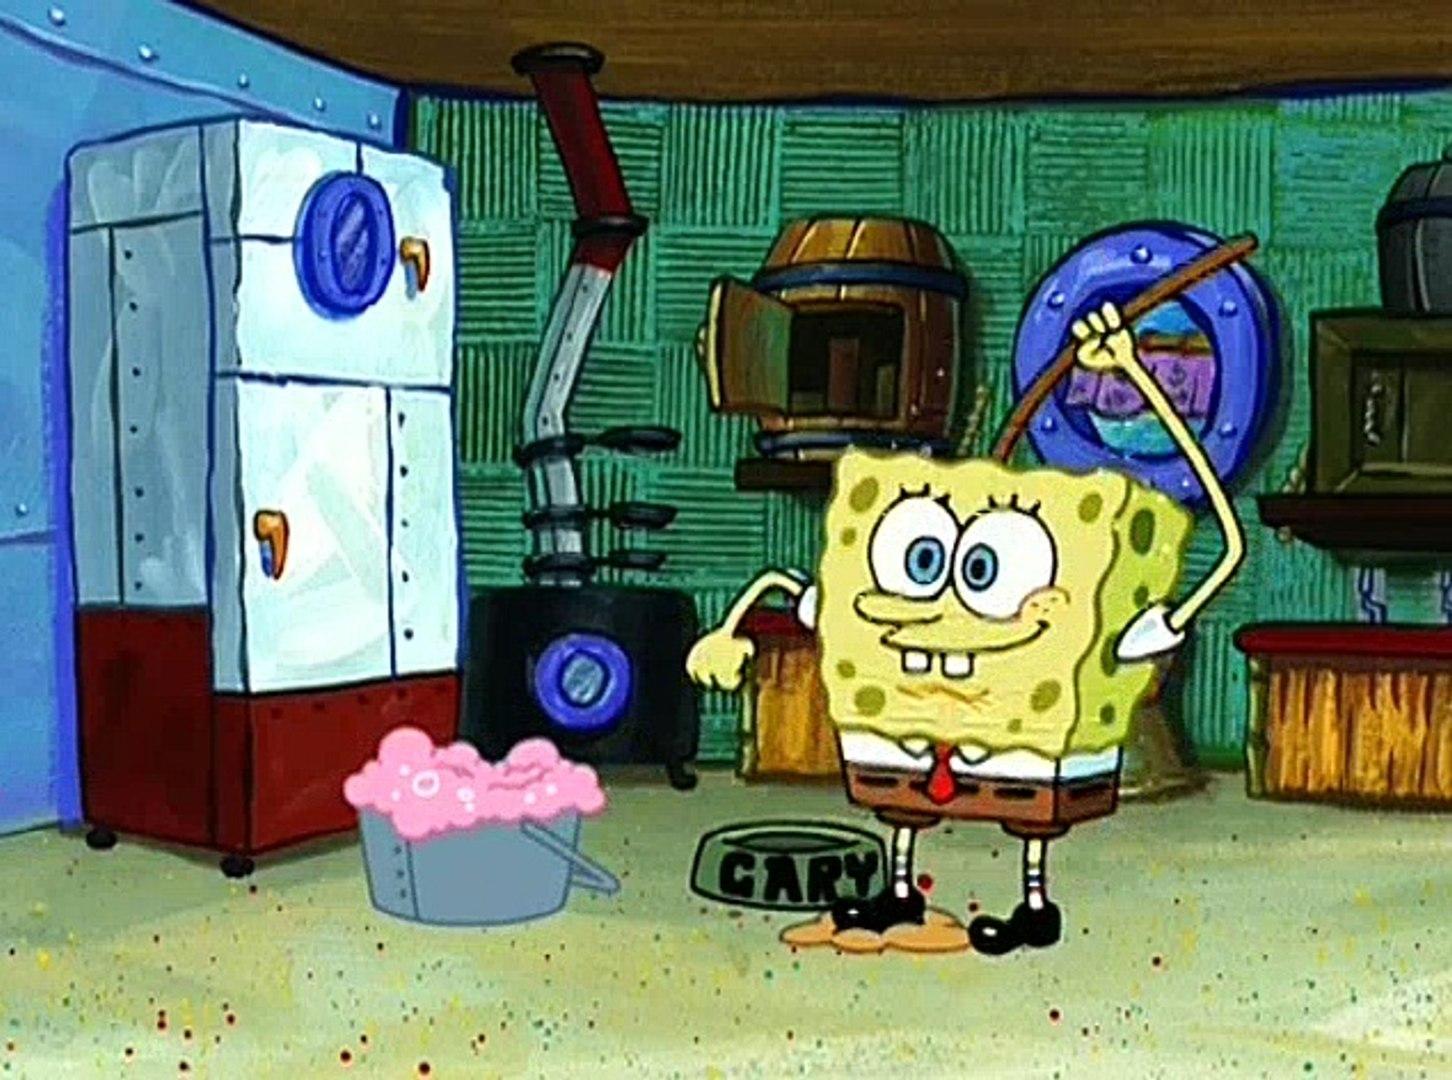 SpongeBob SquarePants - S02E35 - Procrastination